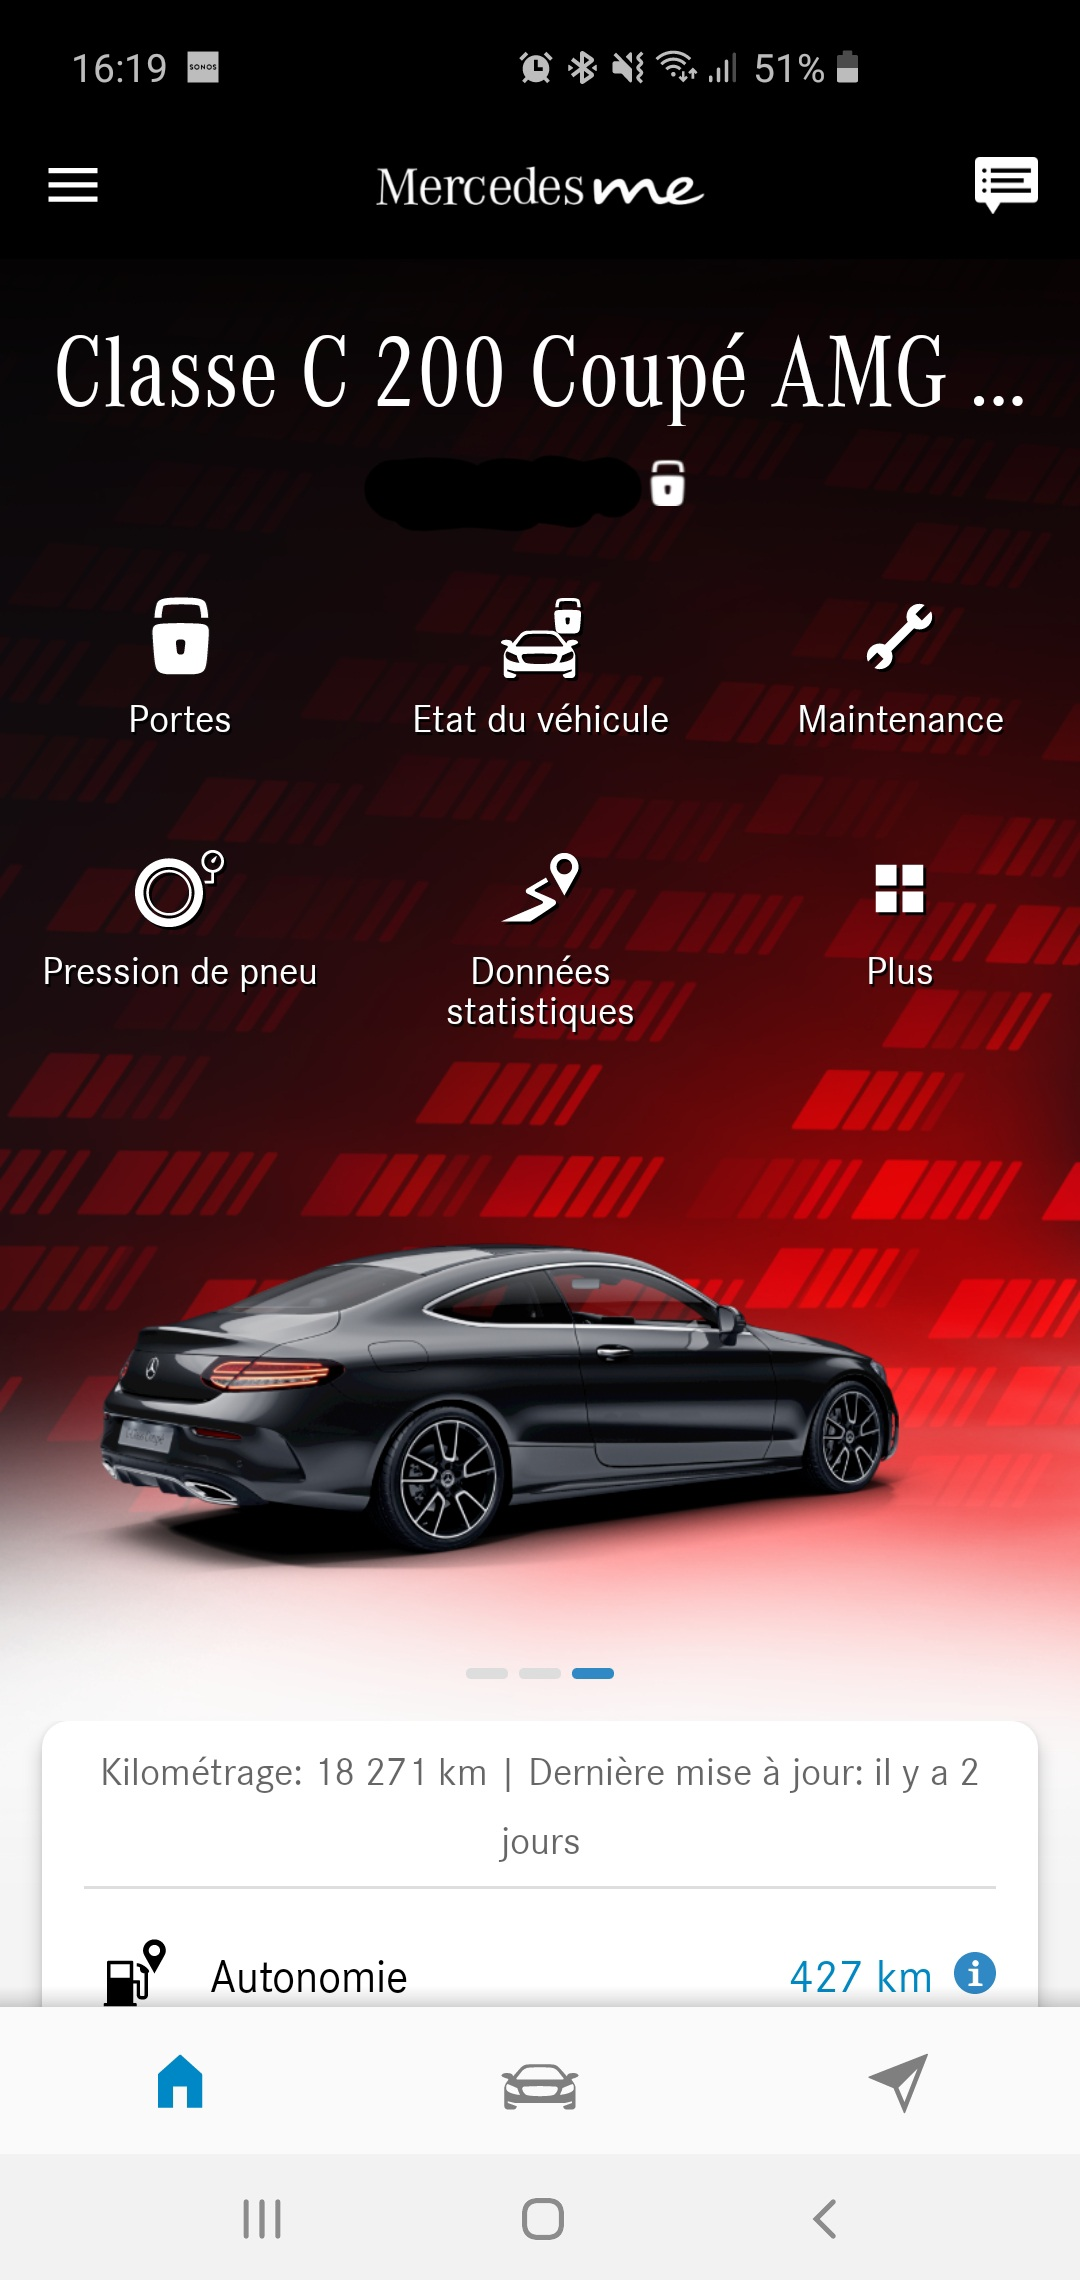 Mercedes Me Rouge.